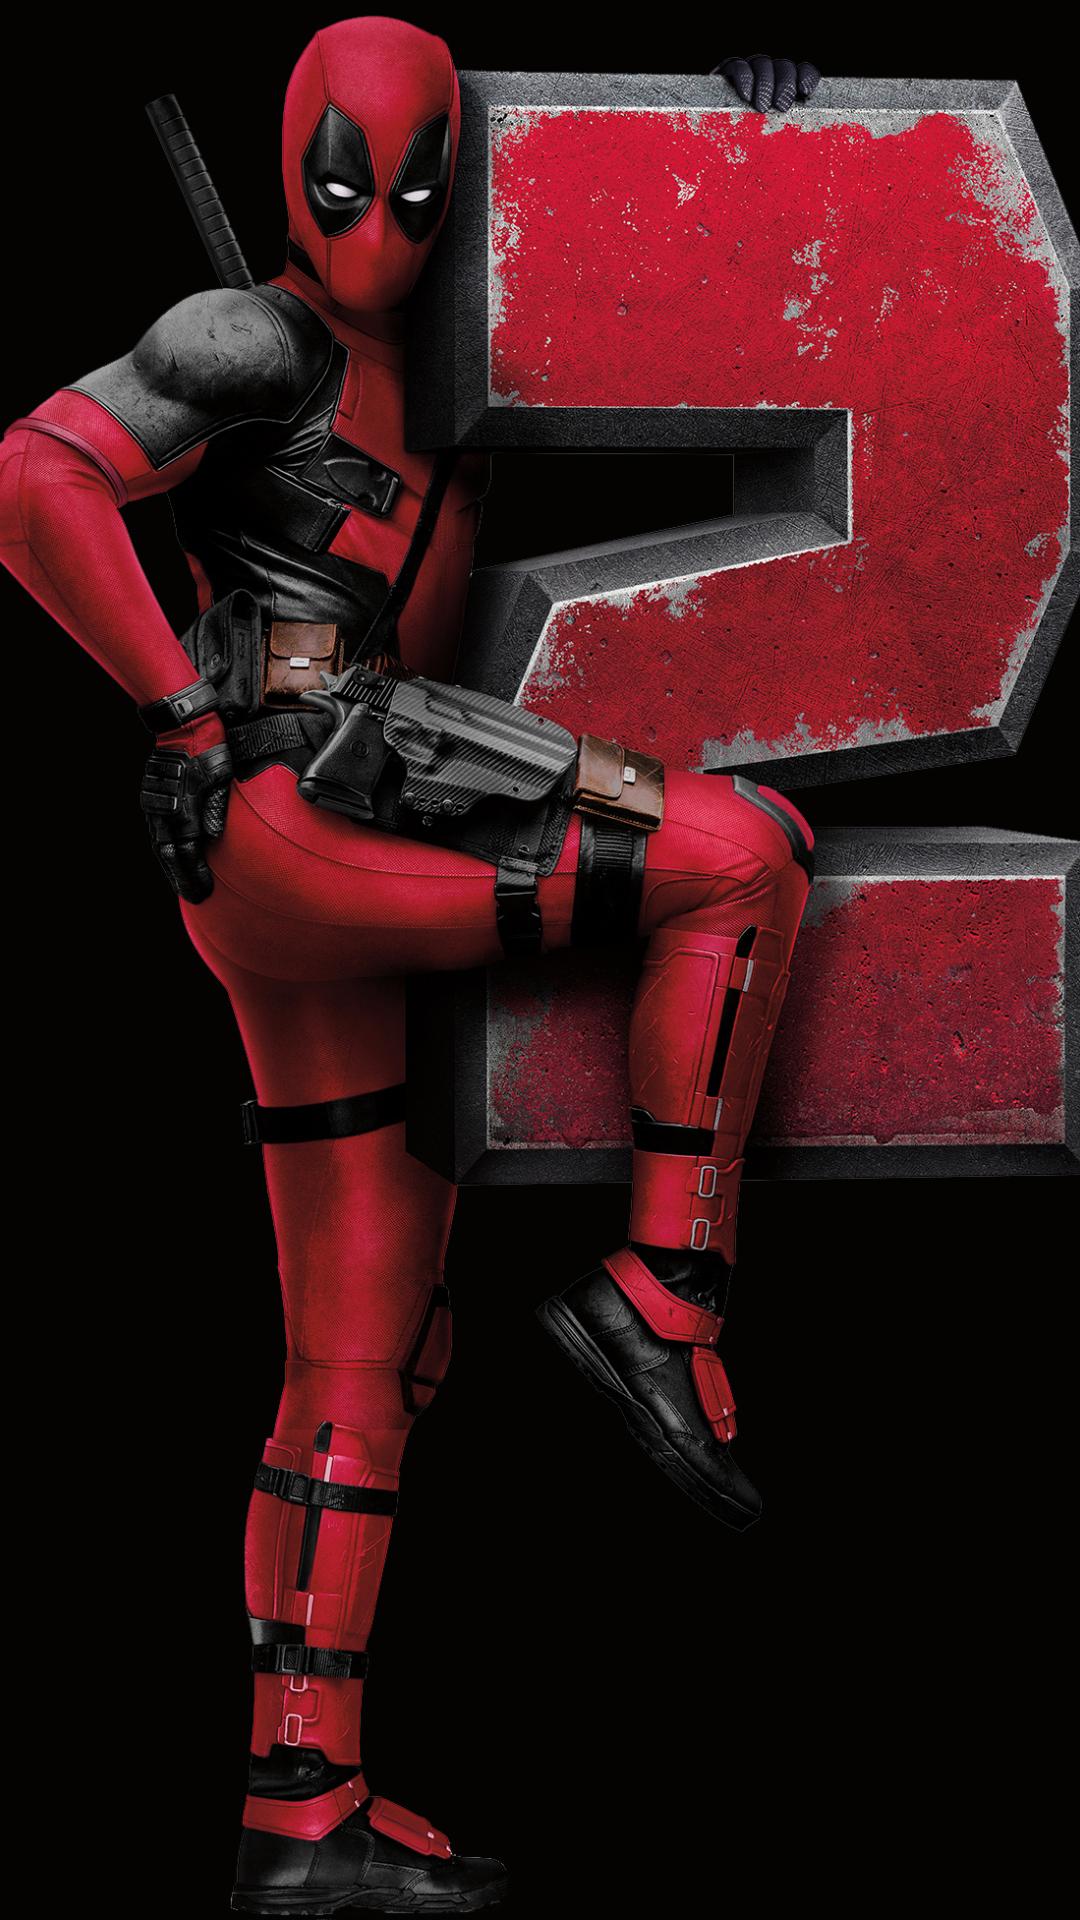 Download Deadpool 2 Ryan Reynolds Poster 1920x1080 ...